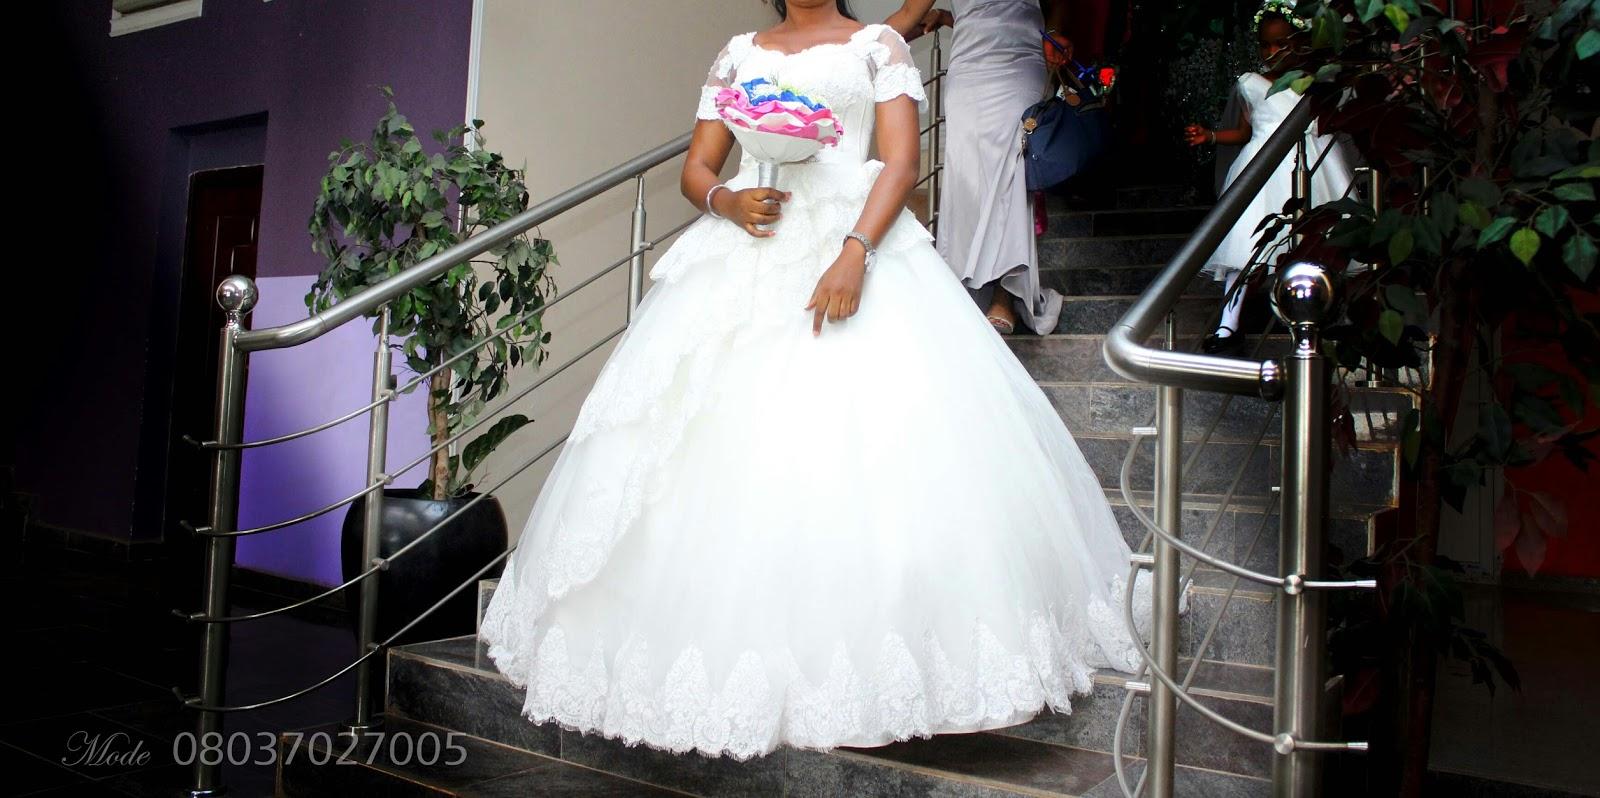 Wedding Dress Buyers 10 Nice Good luck to the